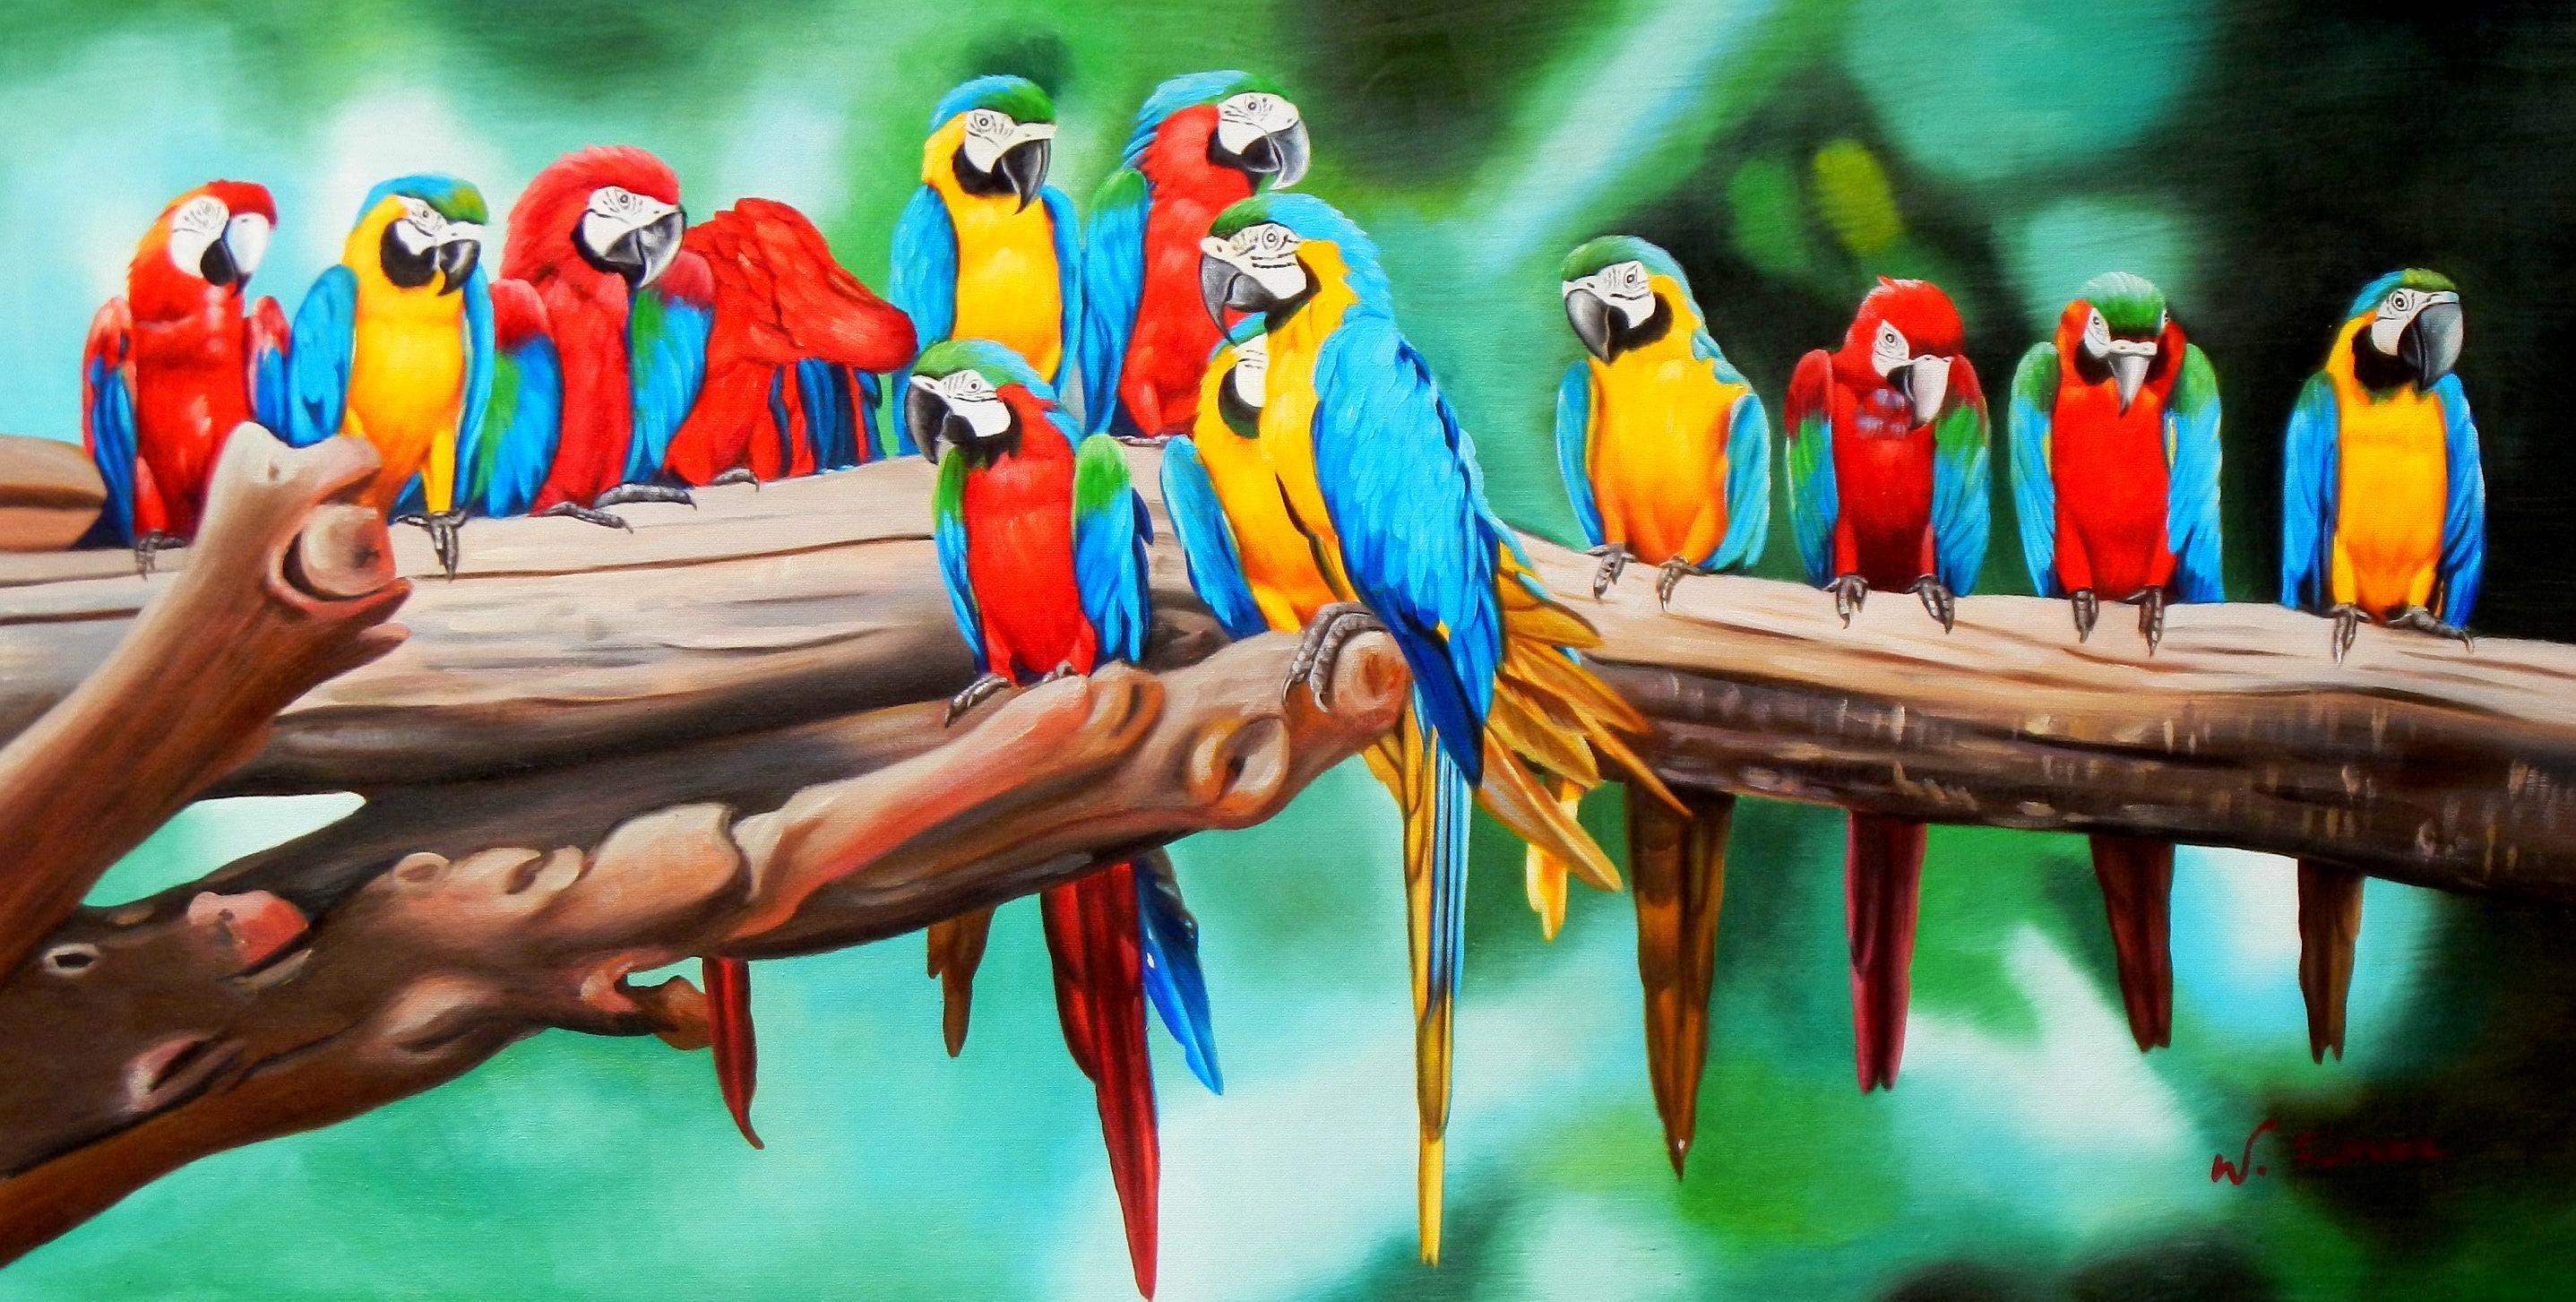 Modern Art - Tutti Frutti Papageien Party f92523 G 60x120cm Ölbild handgemalt